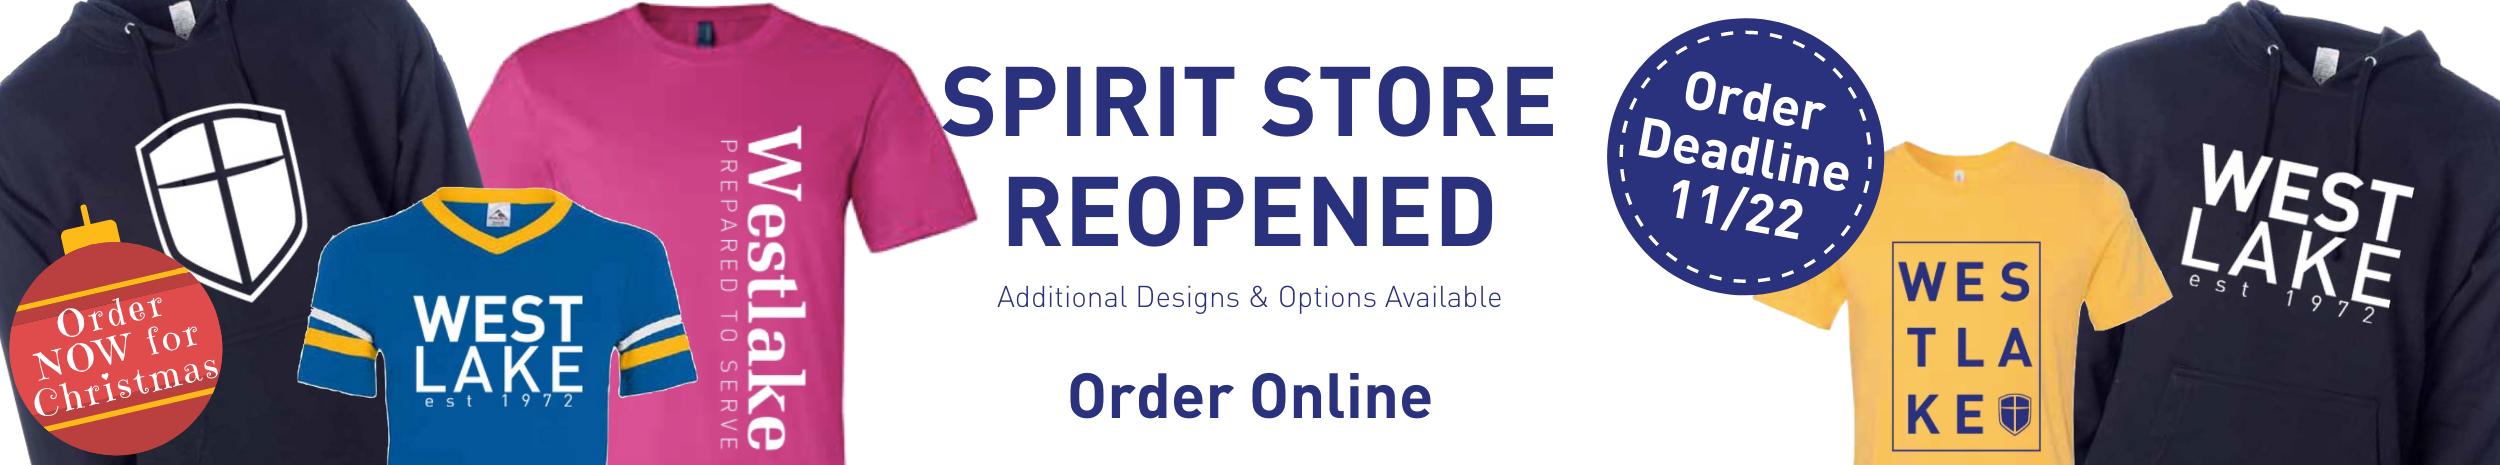 WCA Spirit Wear Store ReOpened - Order now through 11/22